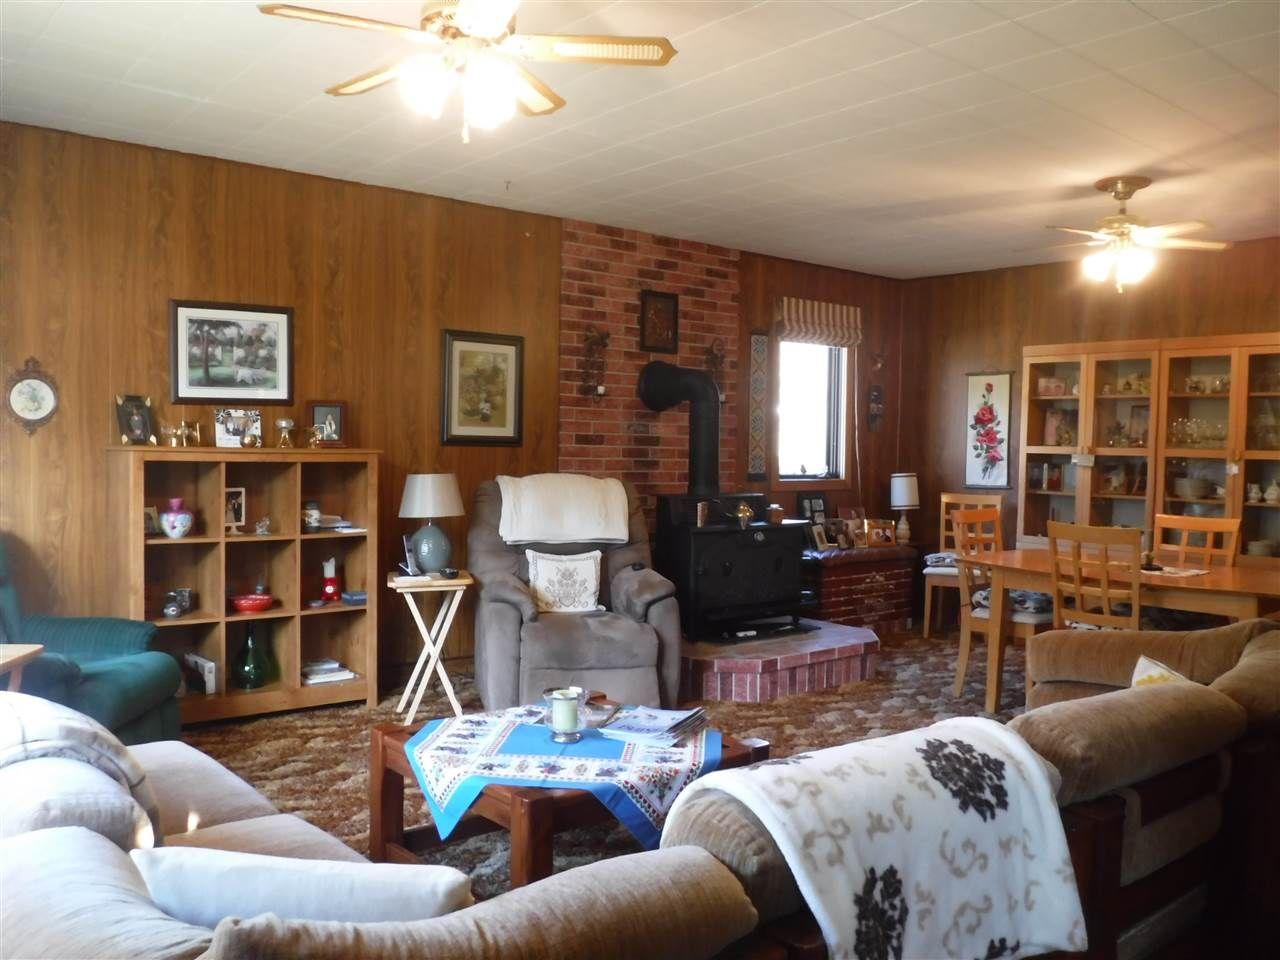 Photo 13: Photos: 1599 MACKENZIE Highway in Bella Coola: Bella Coola/Hagensborg House for sale (Williams Lake (Zone 27))  : MLS®# R2449026